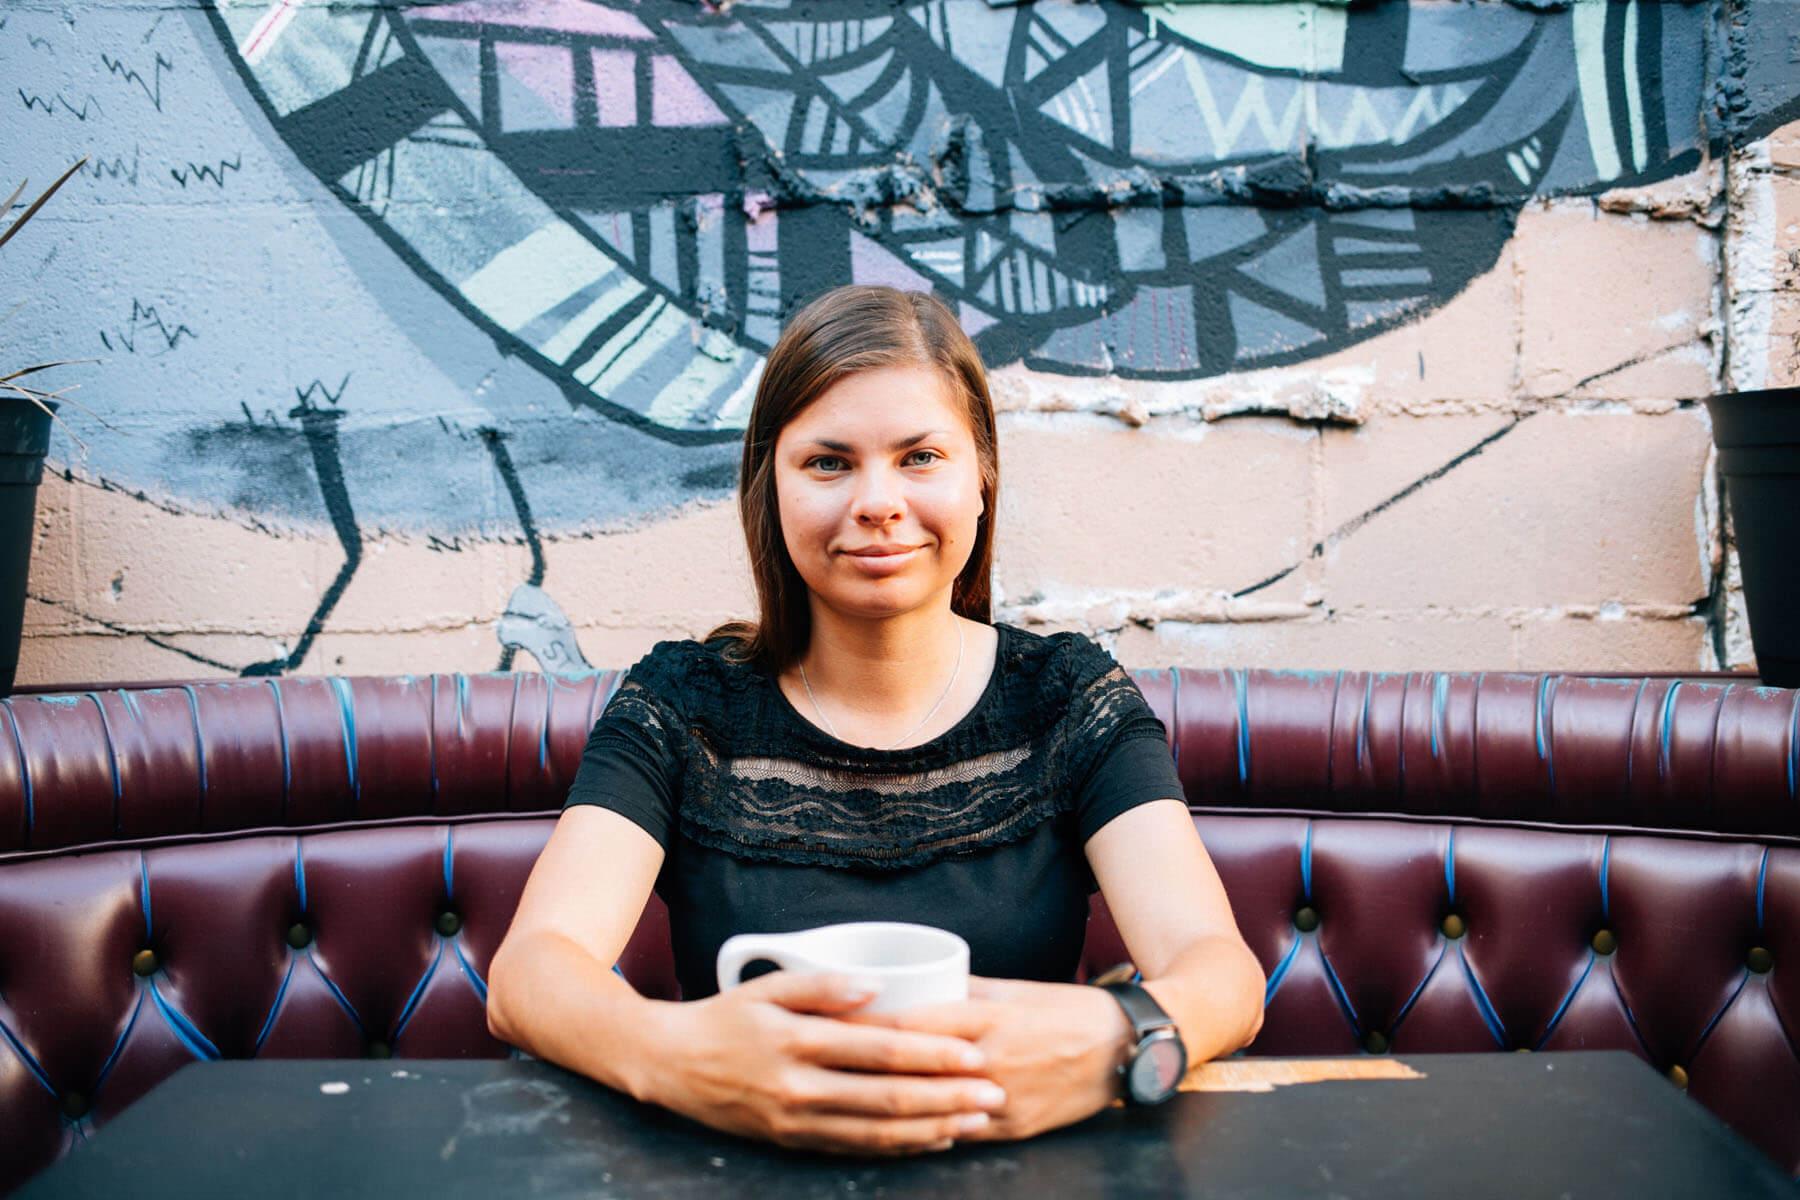 Meet Marina Janeiko, traveling UX designer